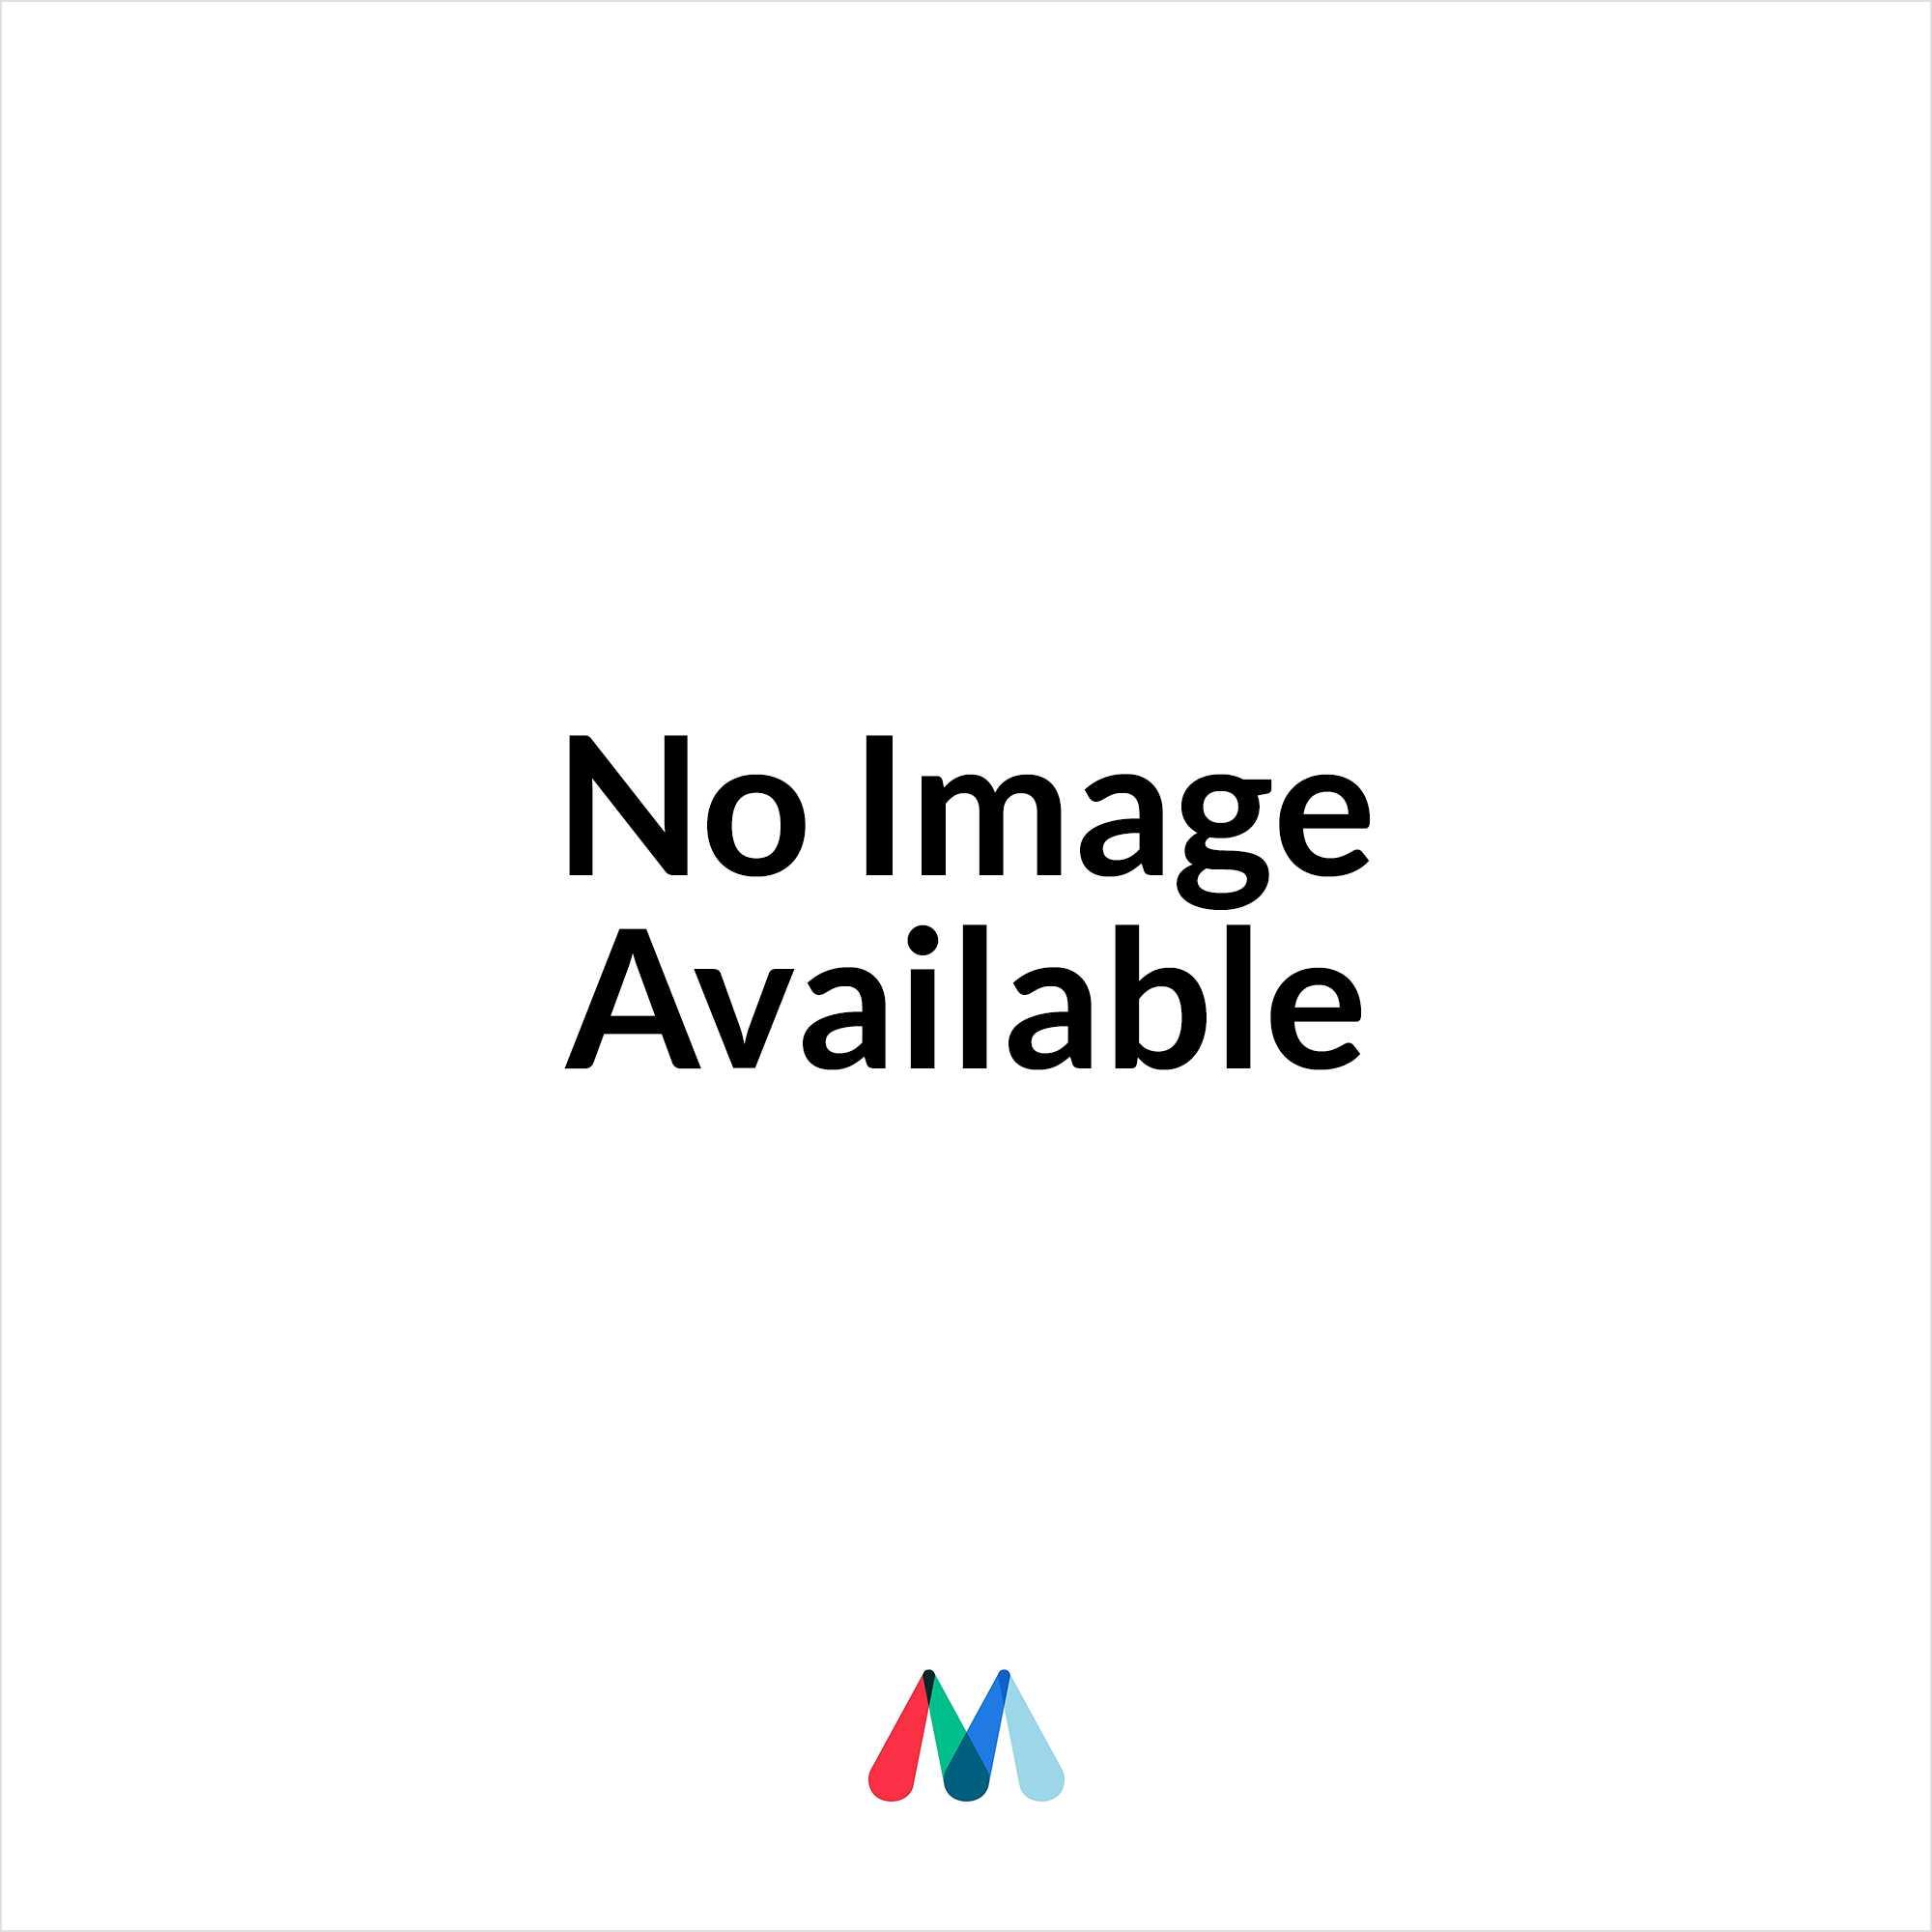 Collingwood Lighting FIBRE LED LIGHT NW Fibre Optic Light Injector - Low voltage